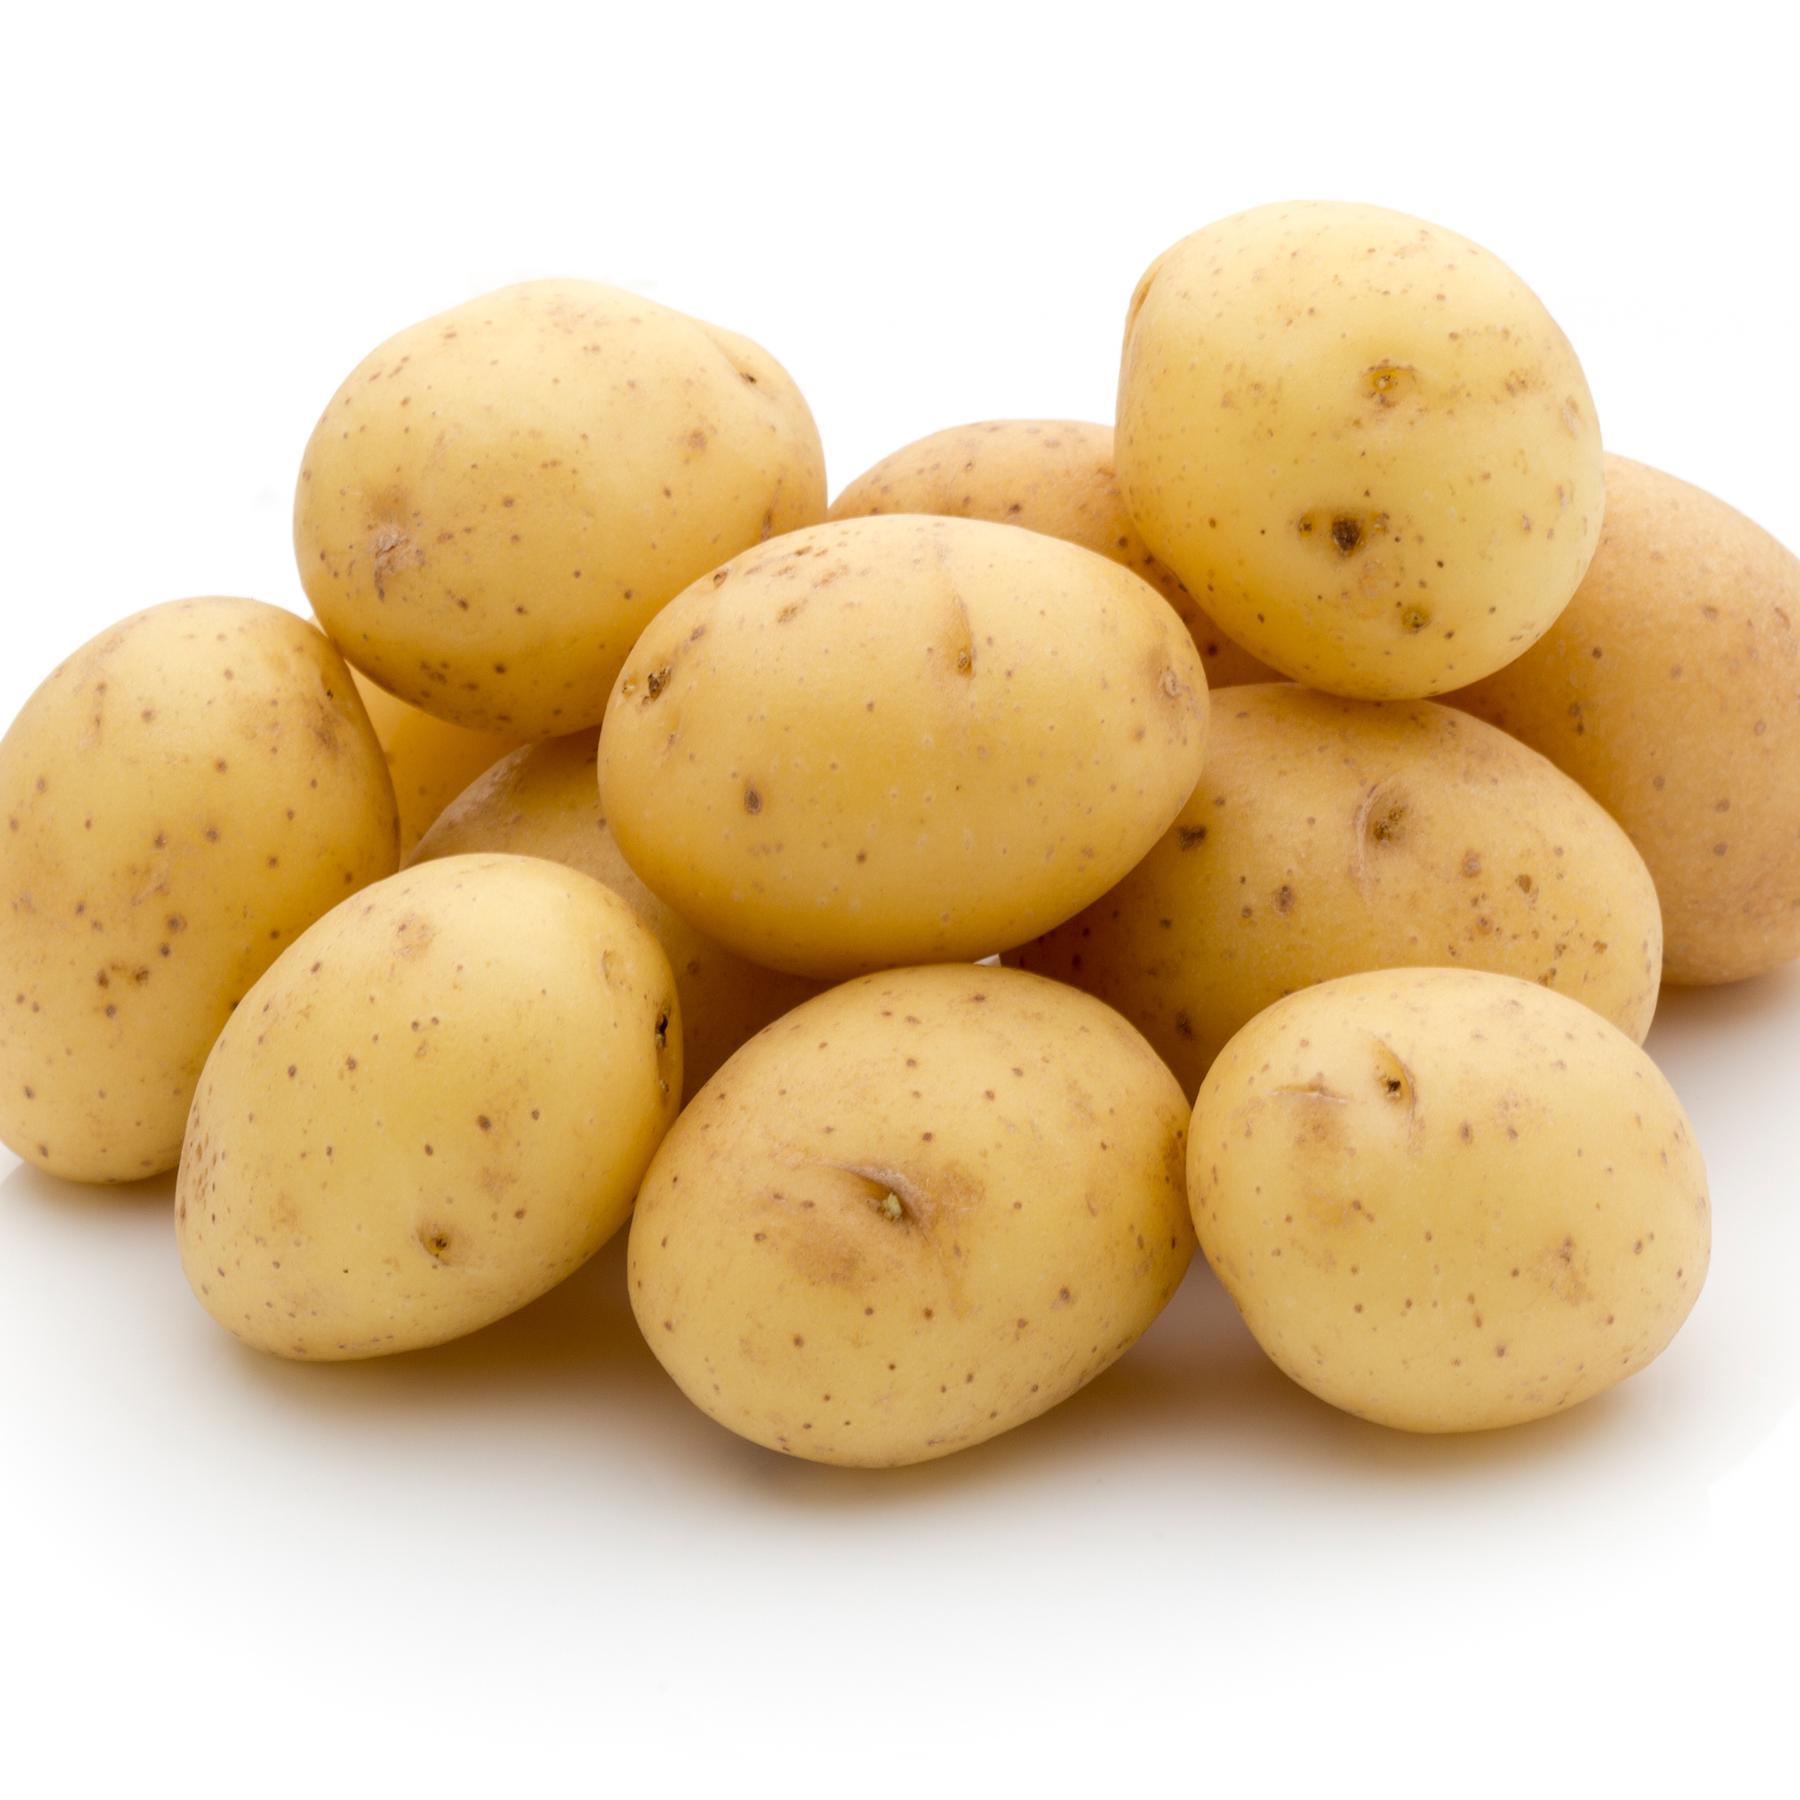 Kartoffel - Die nahrhafte Knolle